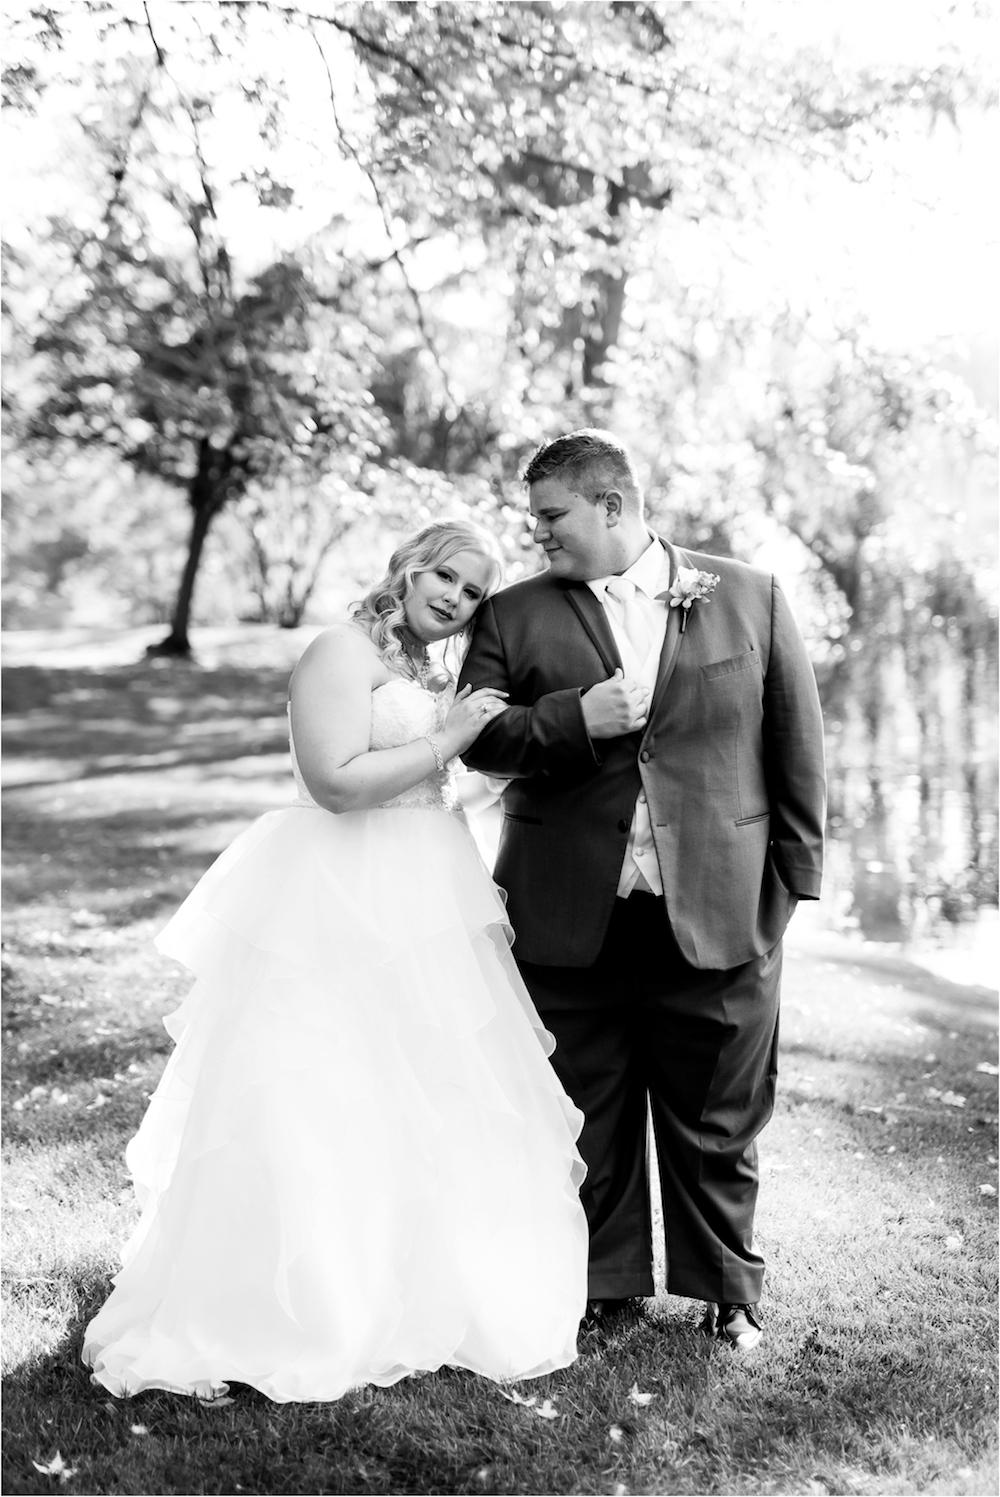 dearborn-michigan-wedding-photo-126.jpg